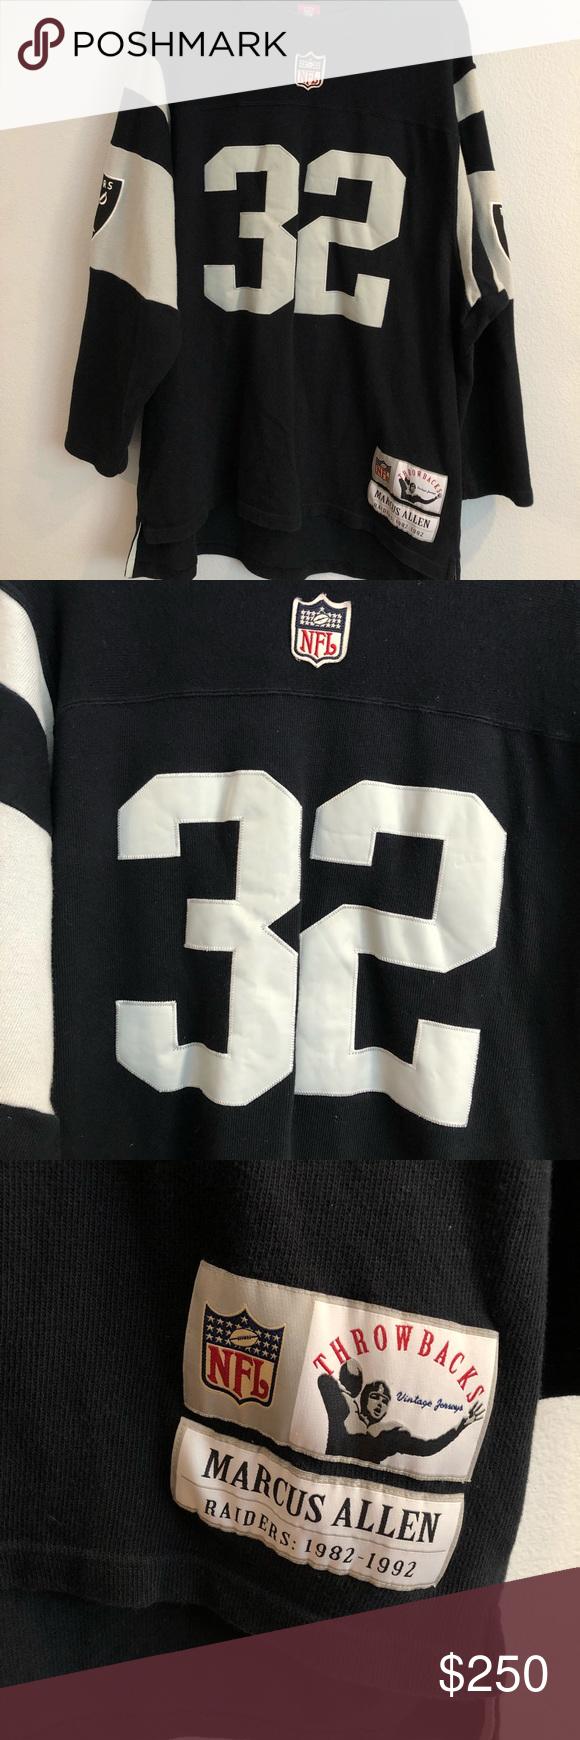 huge selection of 346ed 155d3 NFL THROWBACK REEBOK RAIDERS MARCUS ALLEN JERSEY NFL ...